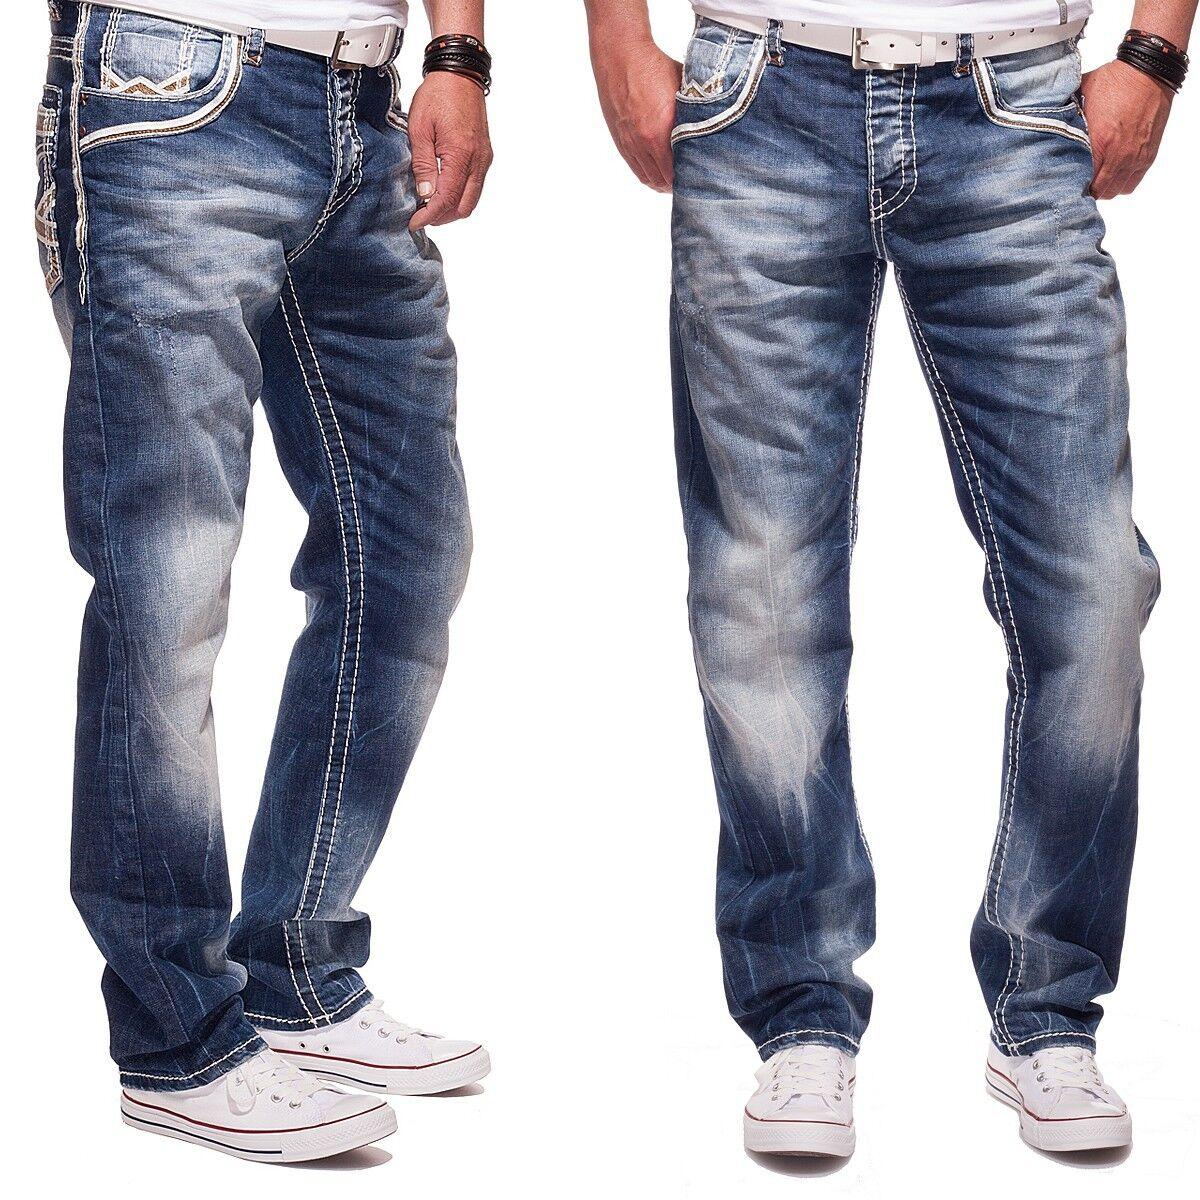 Shelly & Baxx Men Jeans CD223